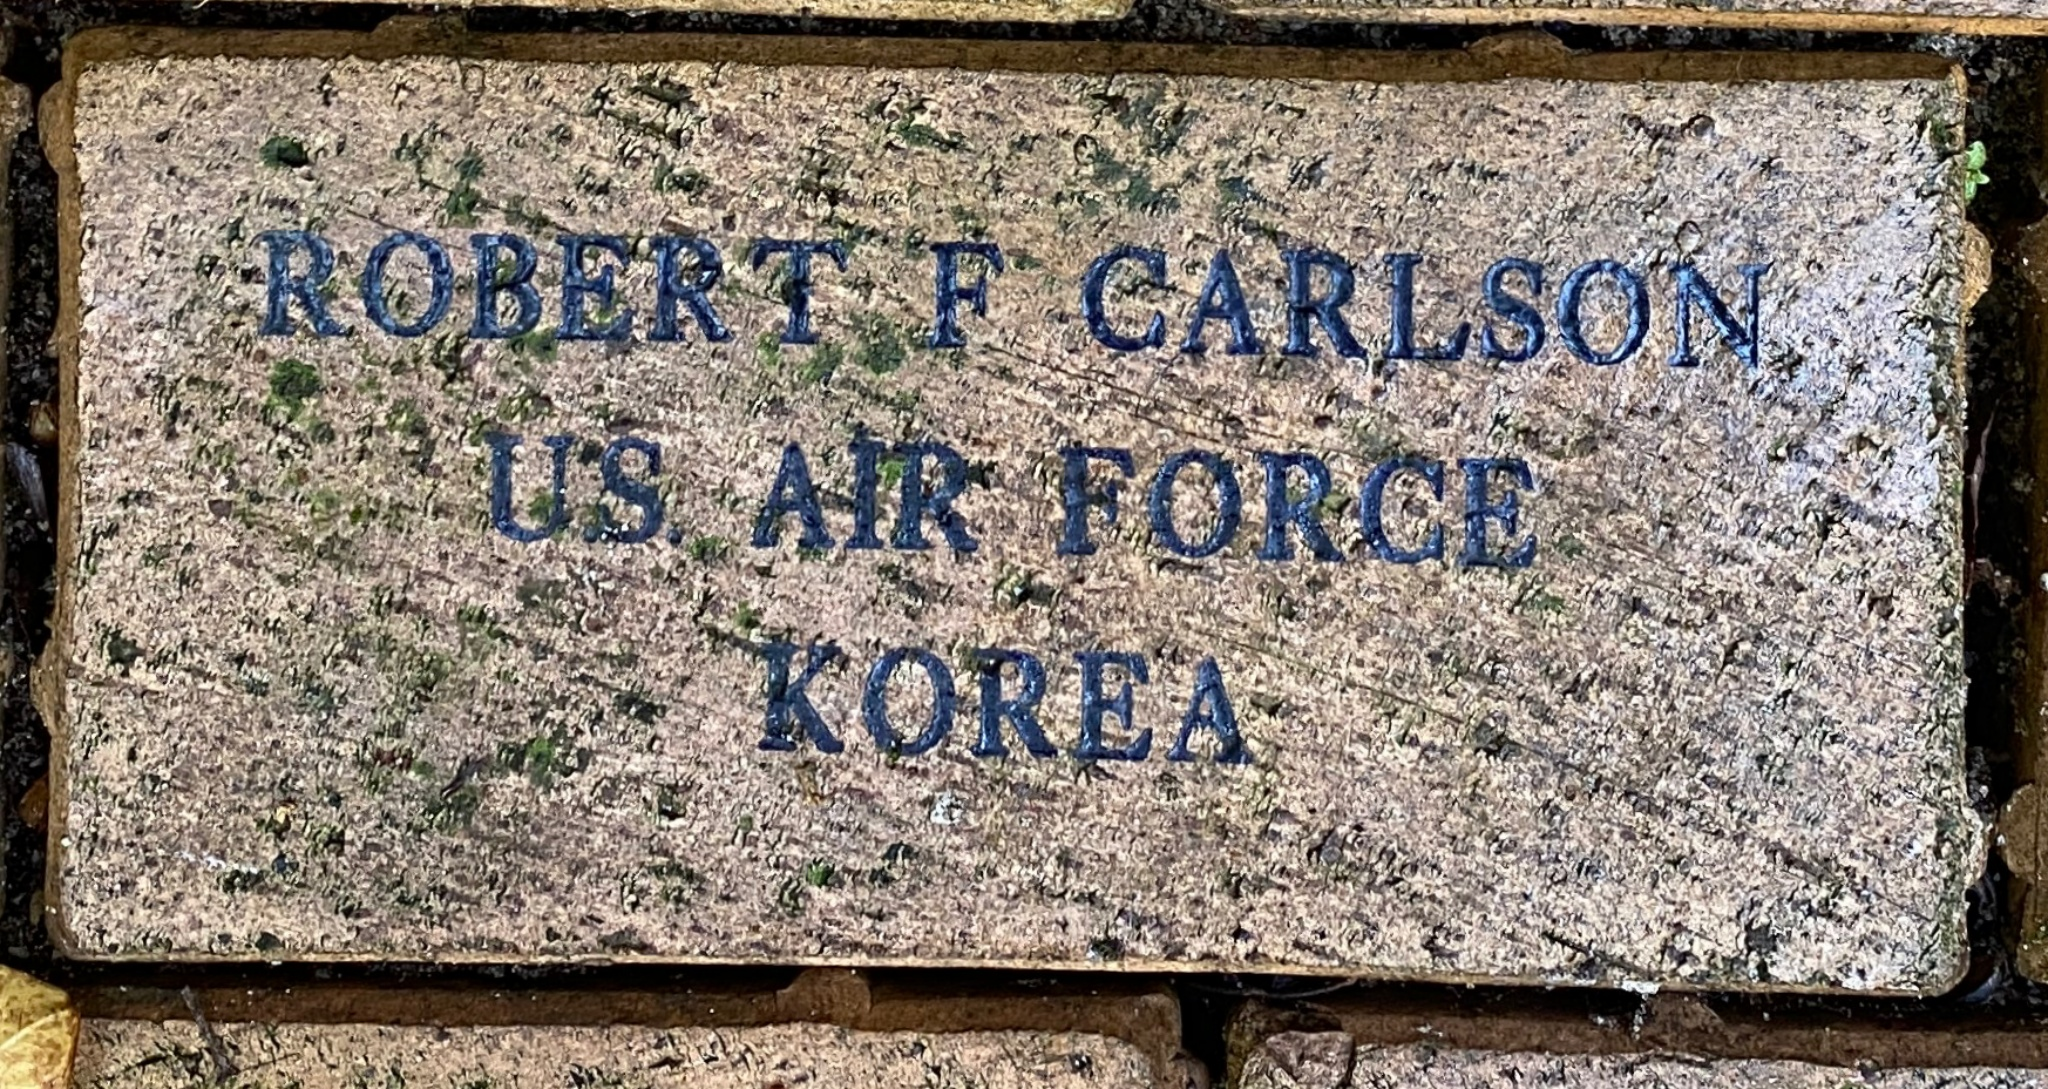 ROBERT F. CARLSON U.S. AIRFORCE KOREA